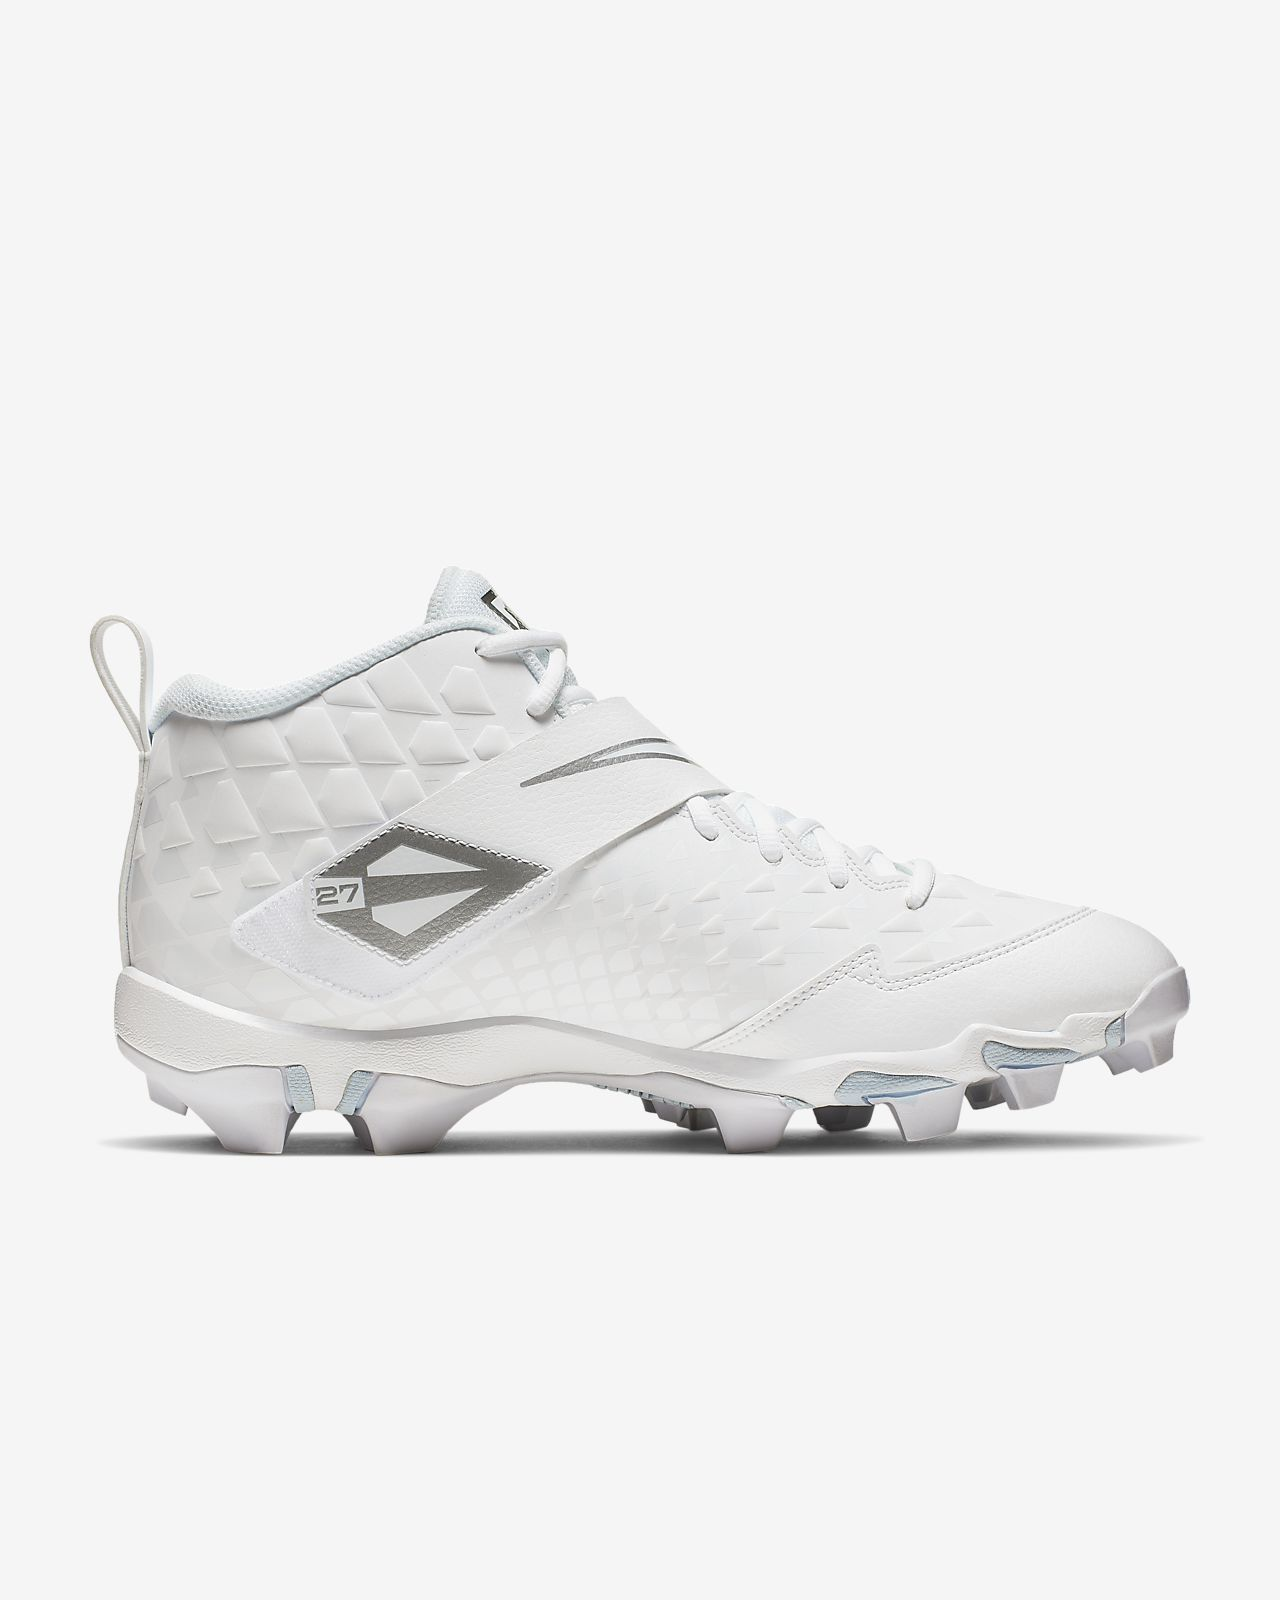 9ac7cfffd6740 Nike Force Zoom Trout 6 Keystone Men's Baseball Cleat. Nike.com